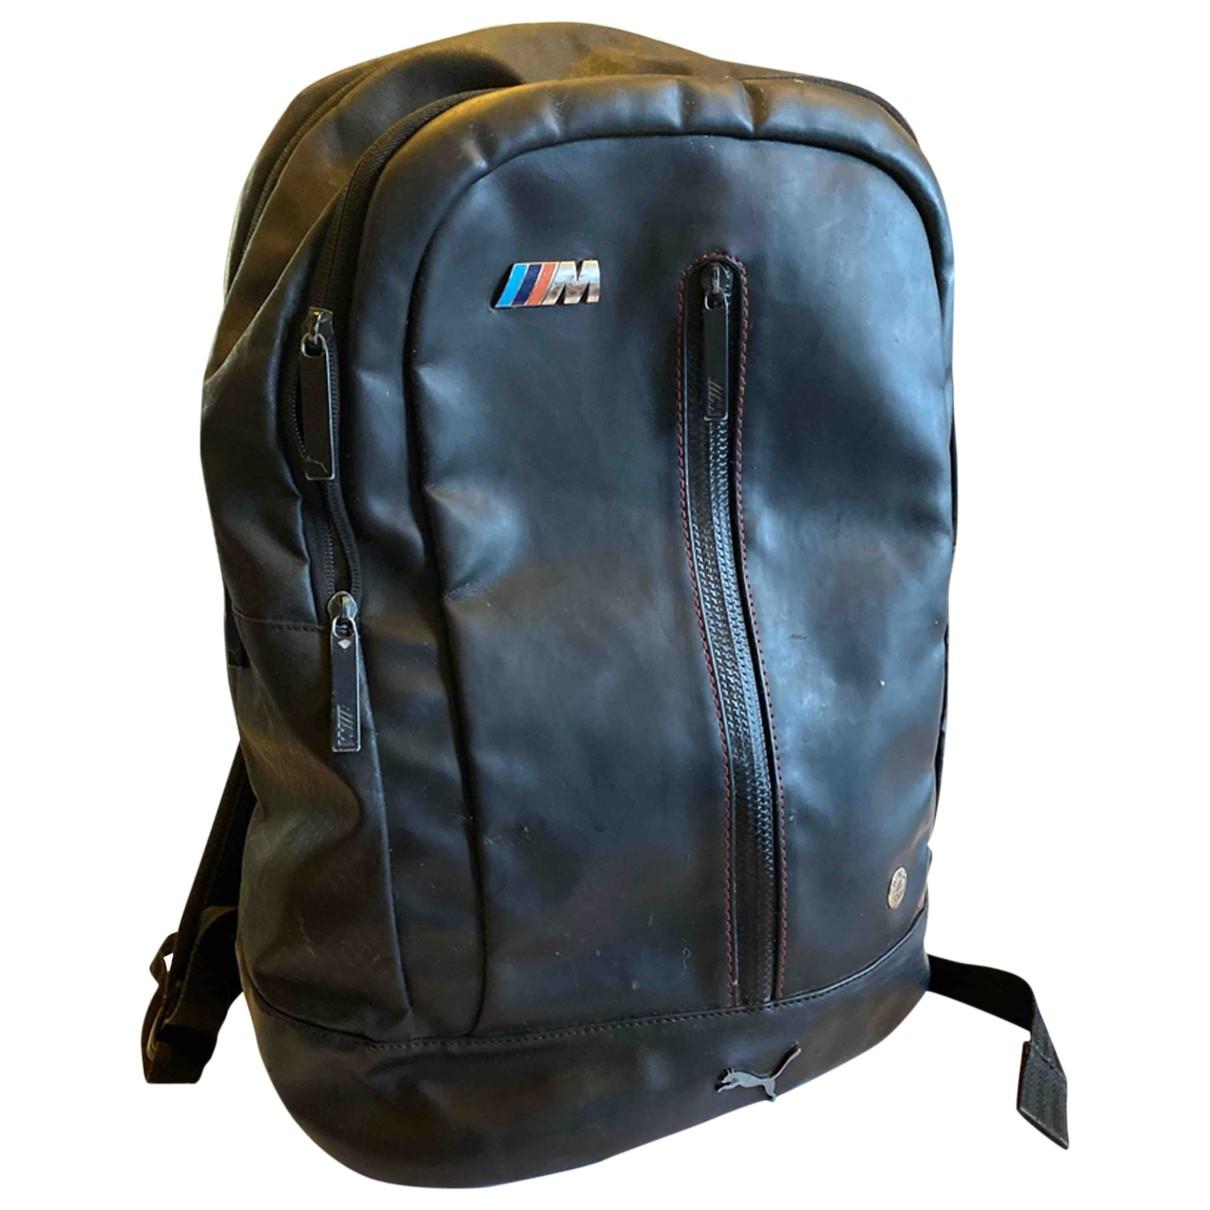 Puma \N Black bag for Men \N